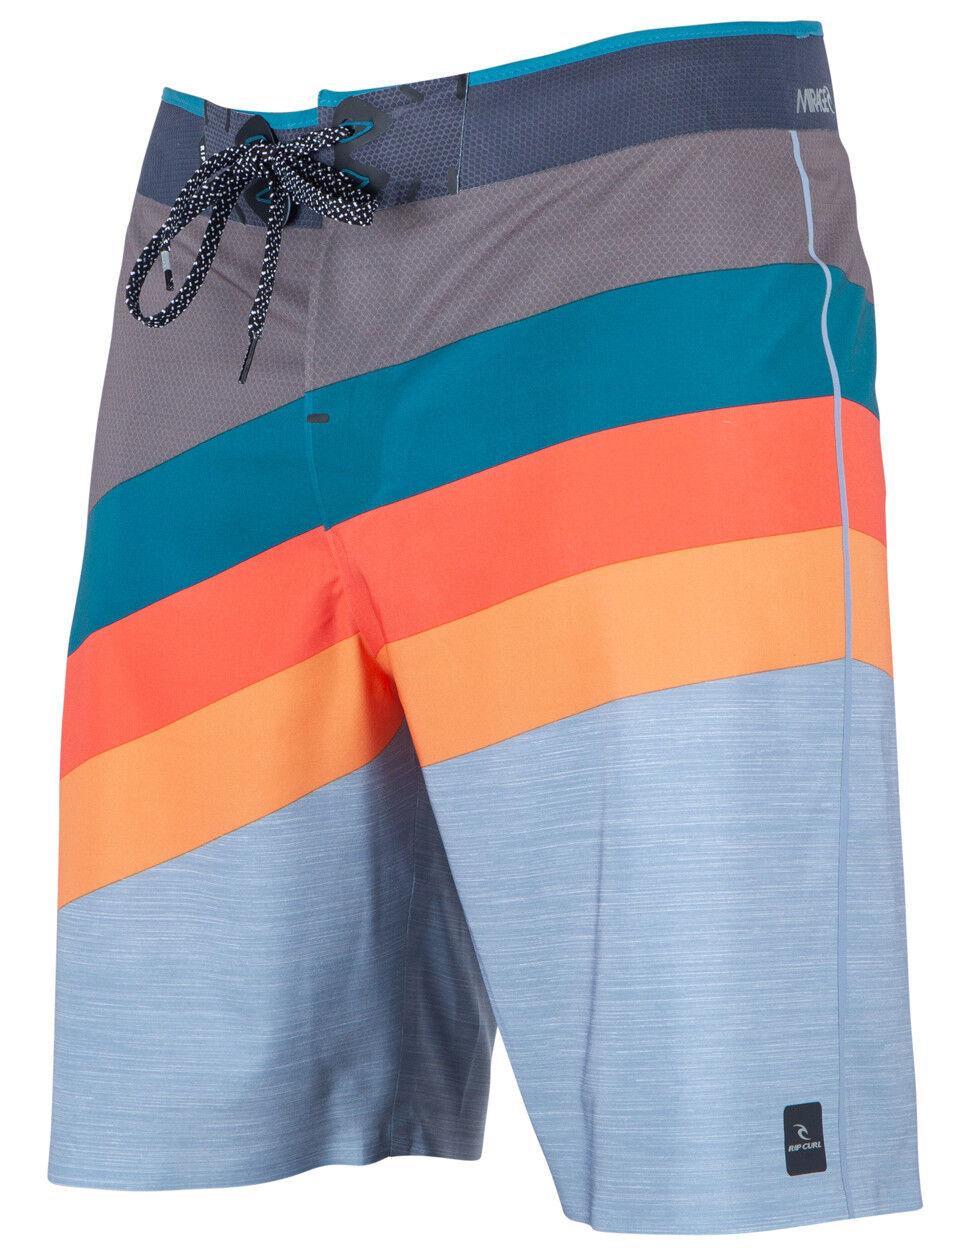 Rip Curl Men's Mirage MF React Ultimate Boardshort Surf - CBOPU7 - Choose color